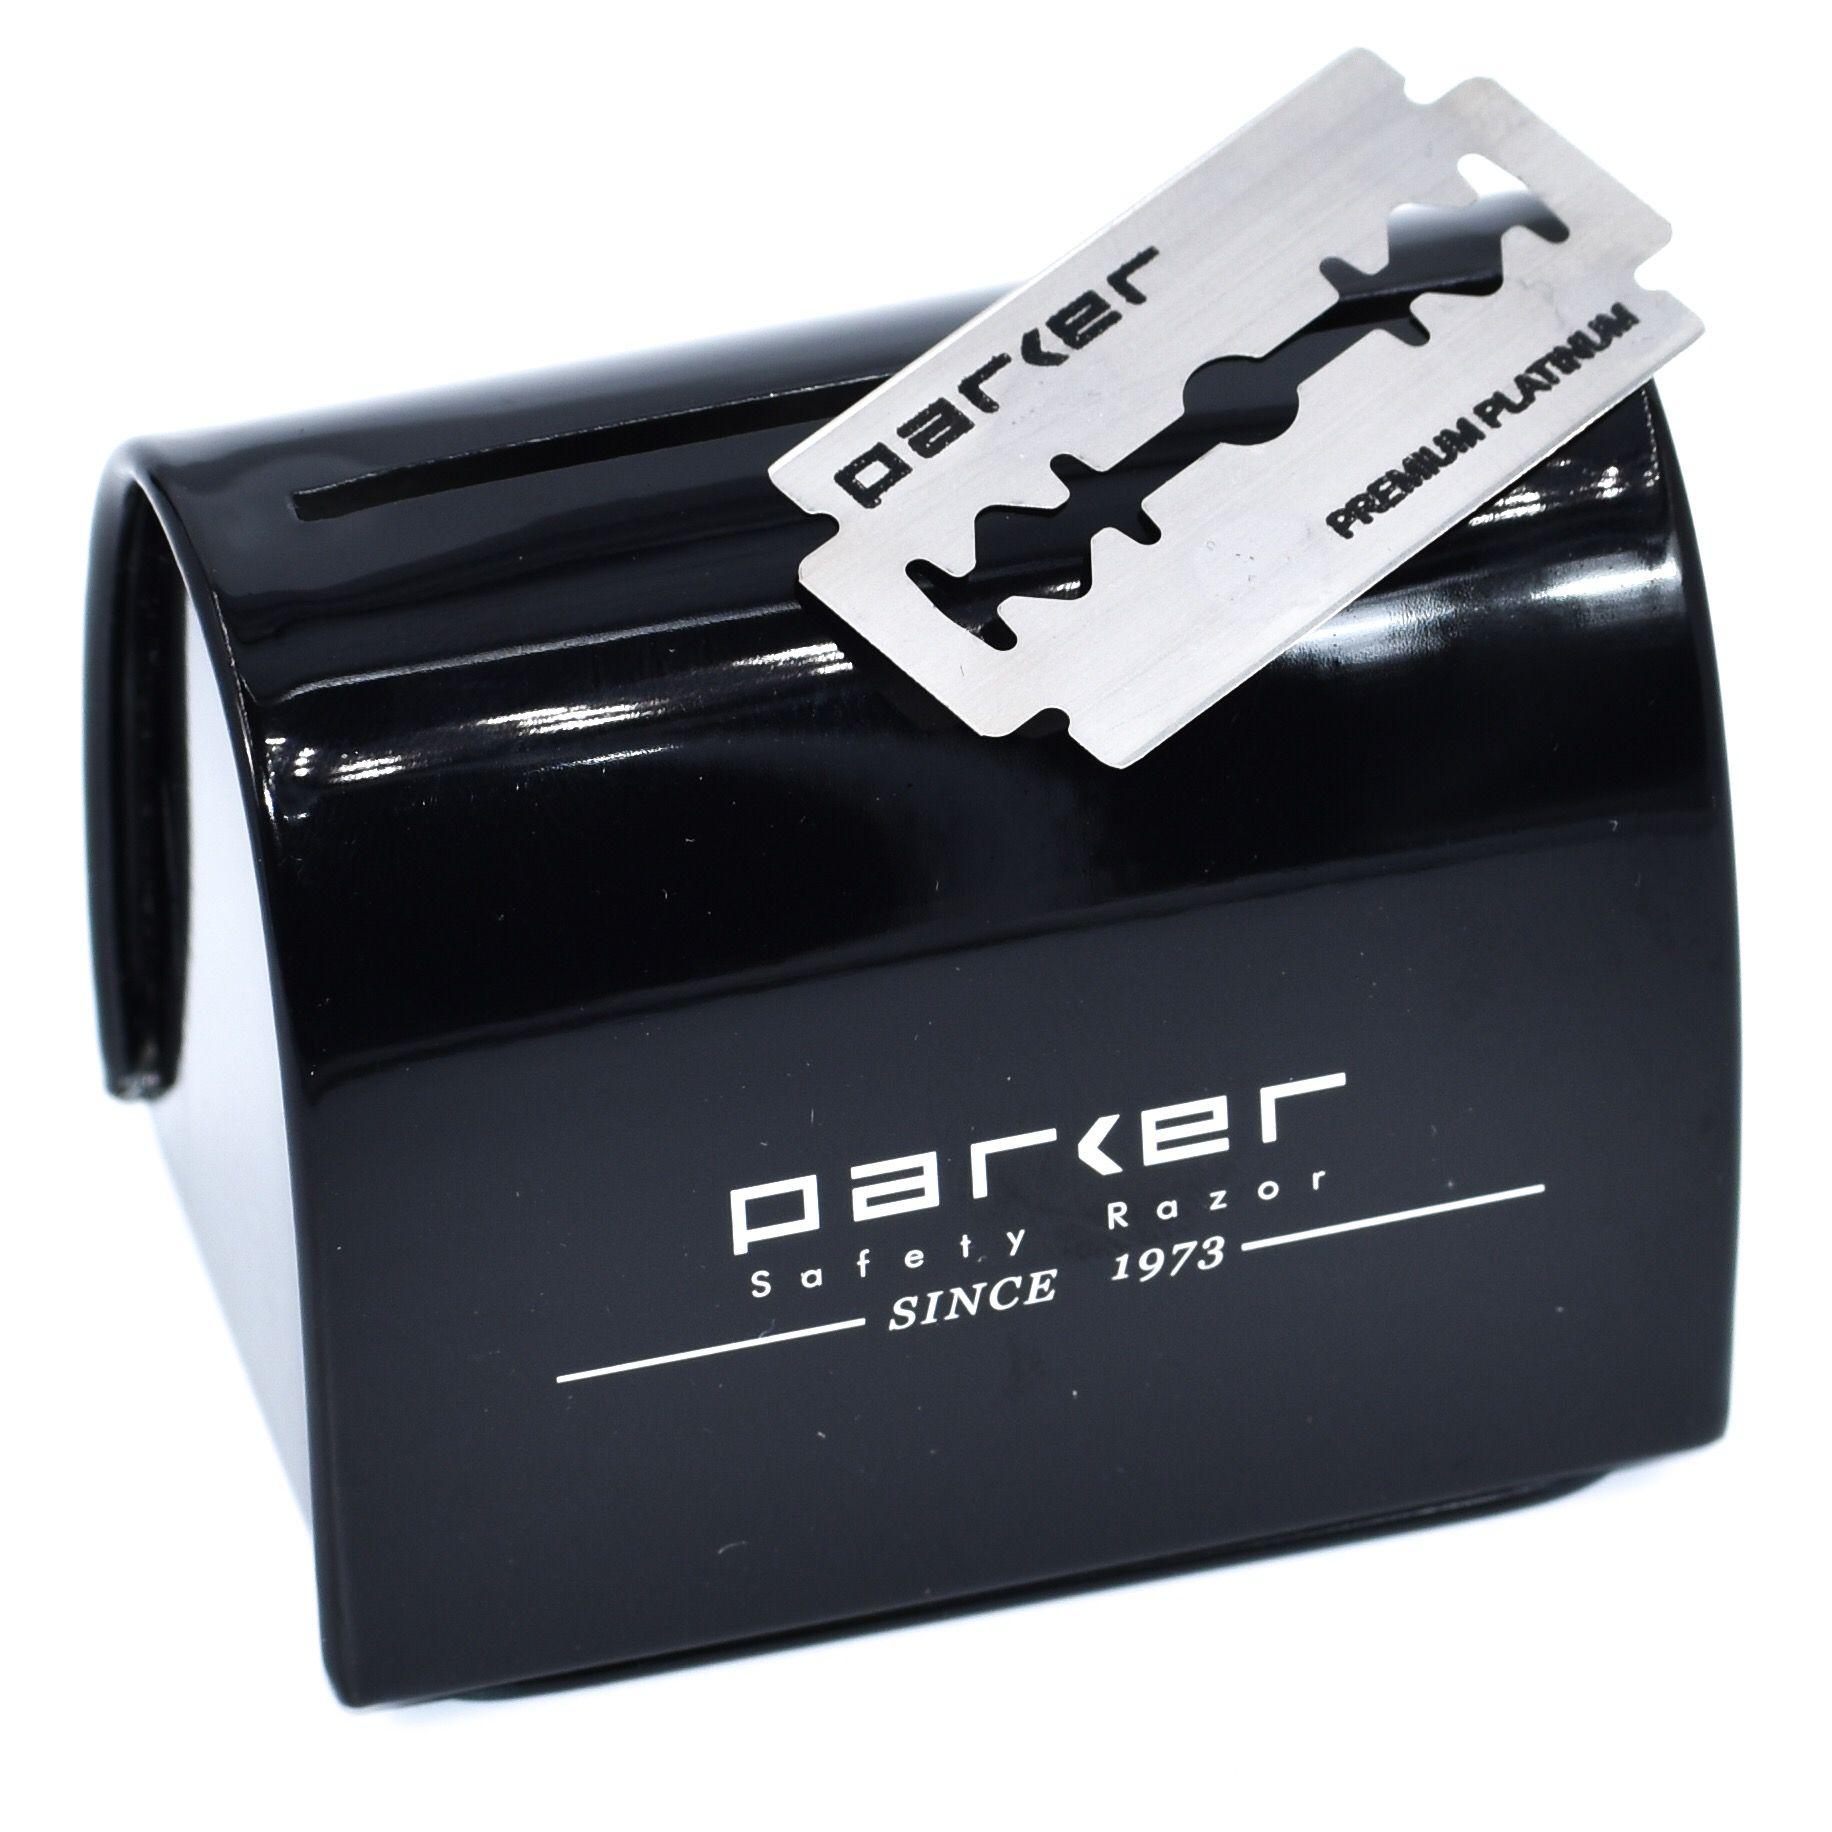 Parker Blade Disposal Bank Shaving soap, Disposable